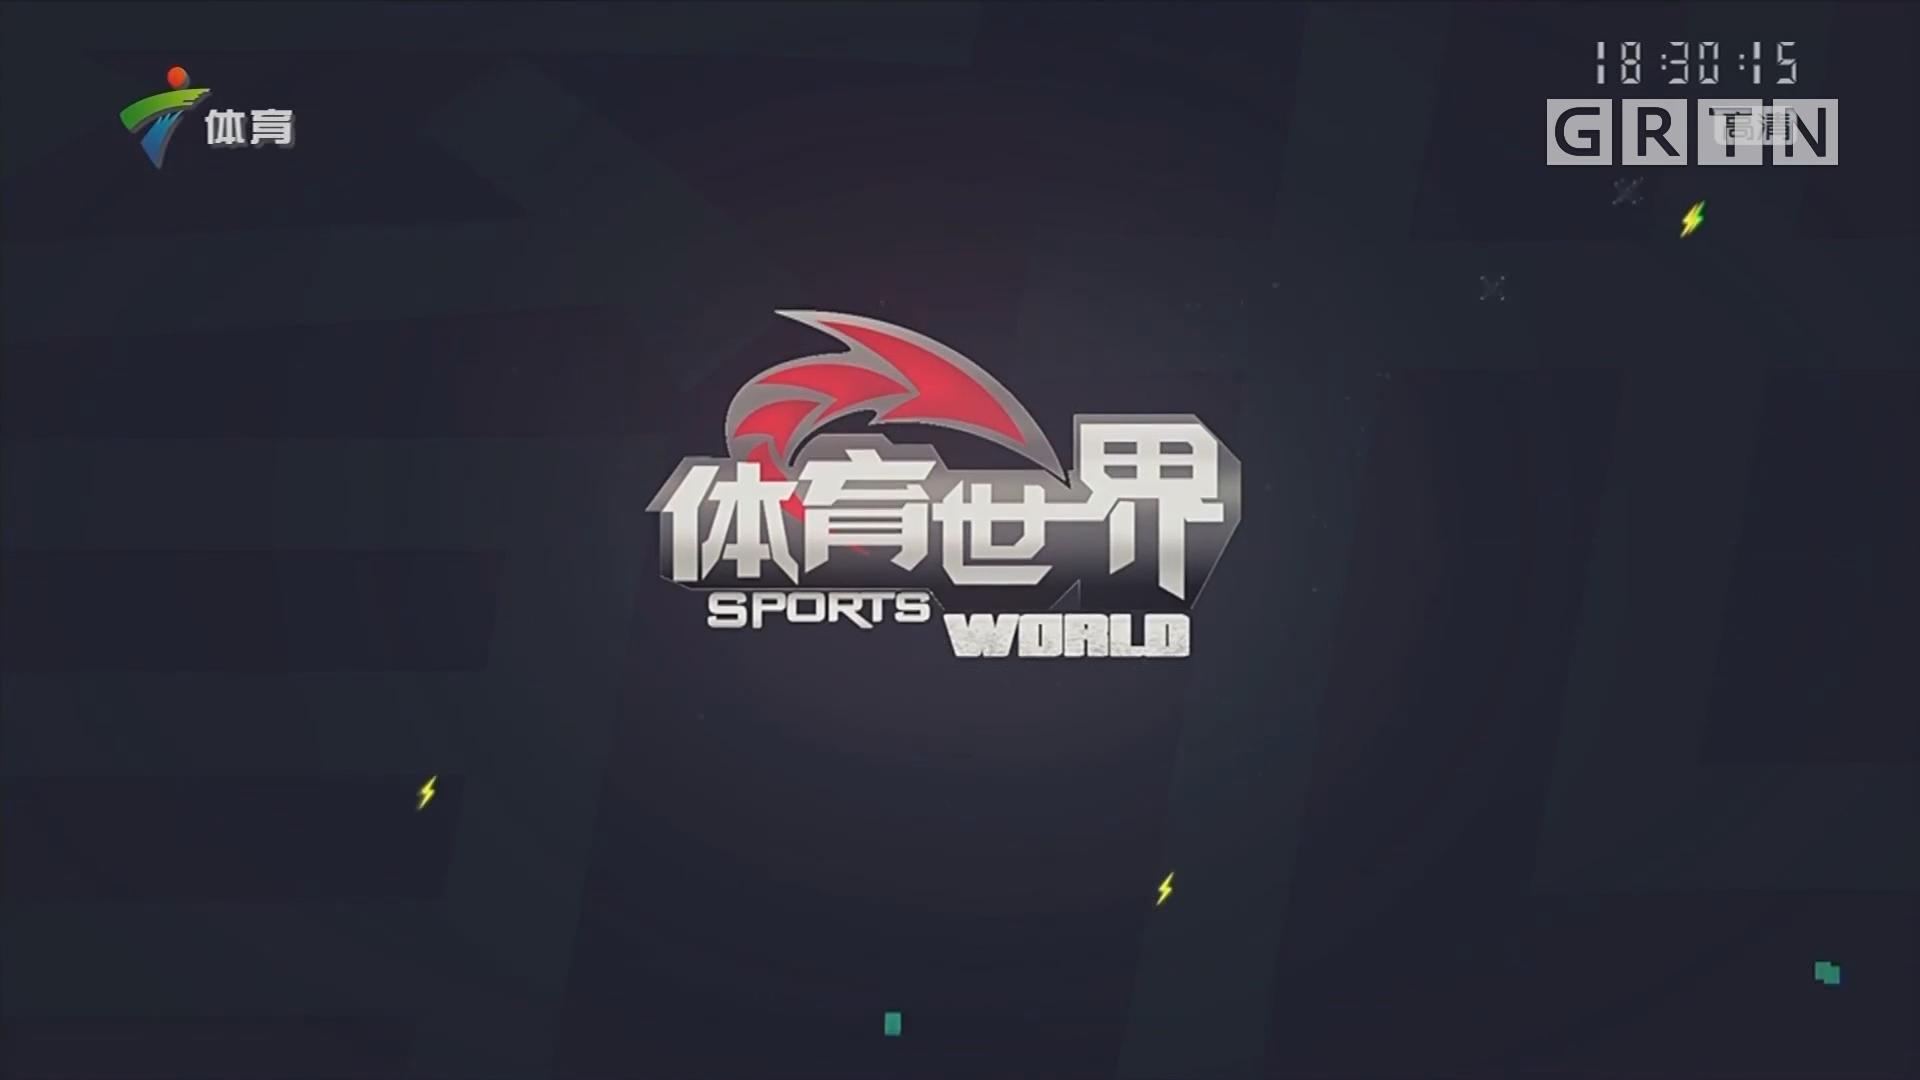 [HD][2019-01-02]体育世界:2019五人足球冠军争霸赛昨日结束